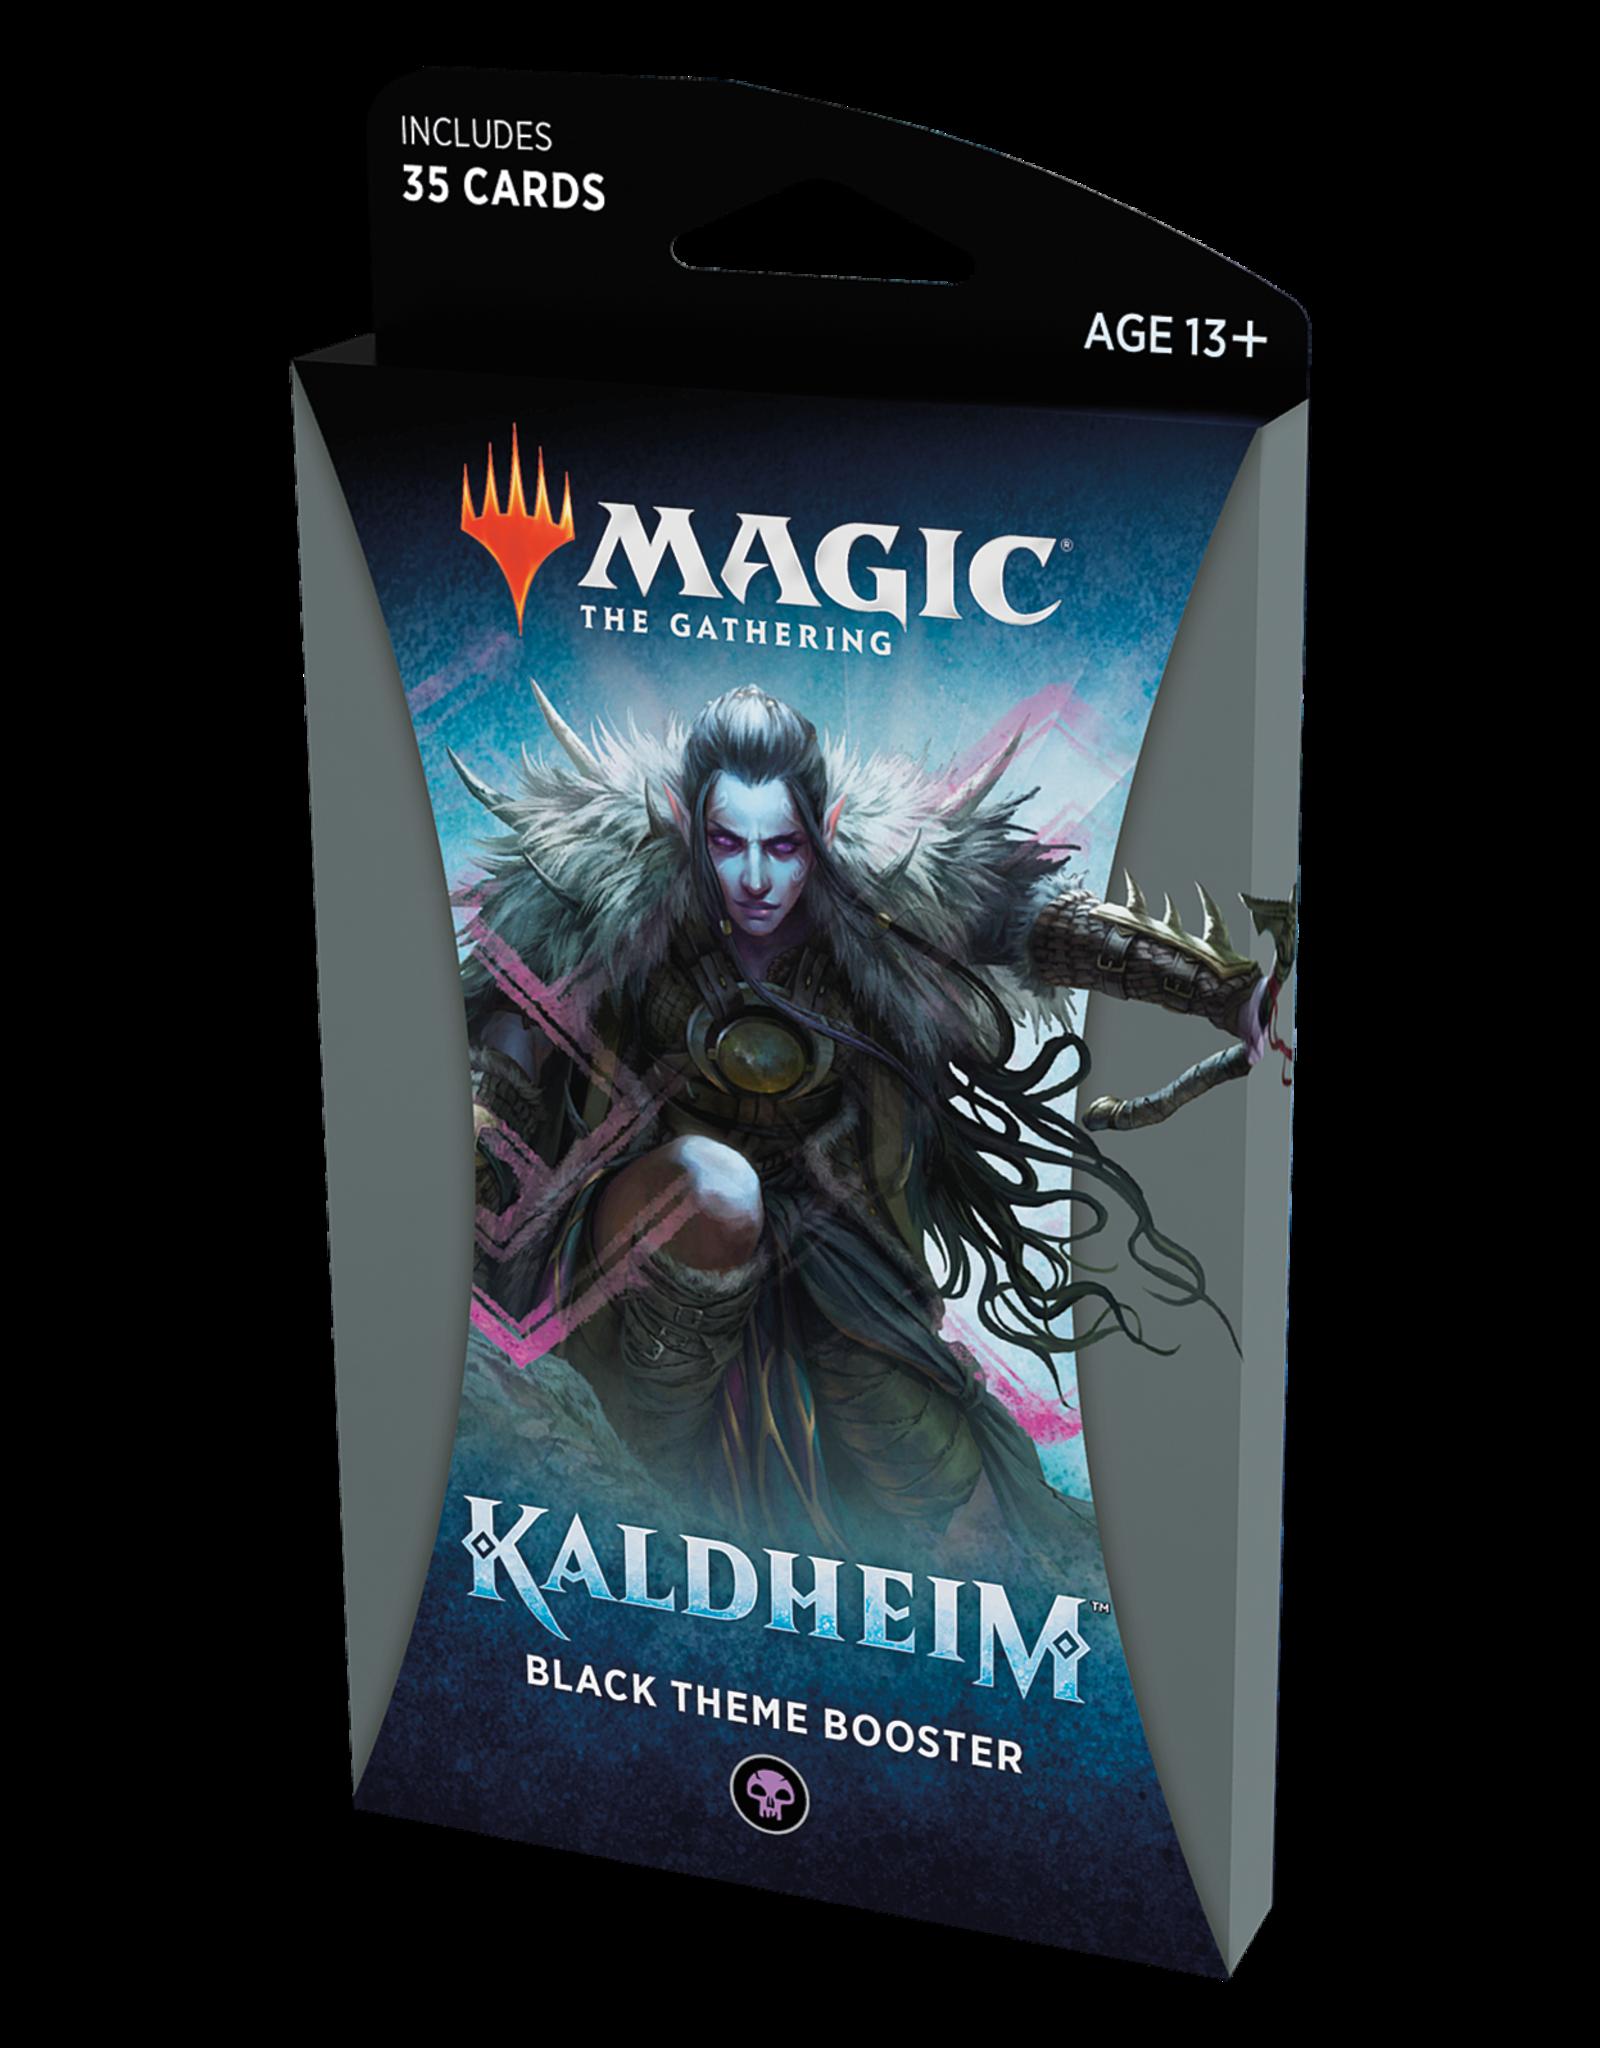 Magic: The Gathering Magic: The Gathering - Kaldheim Theme Booster Pack: Black